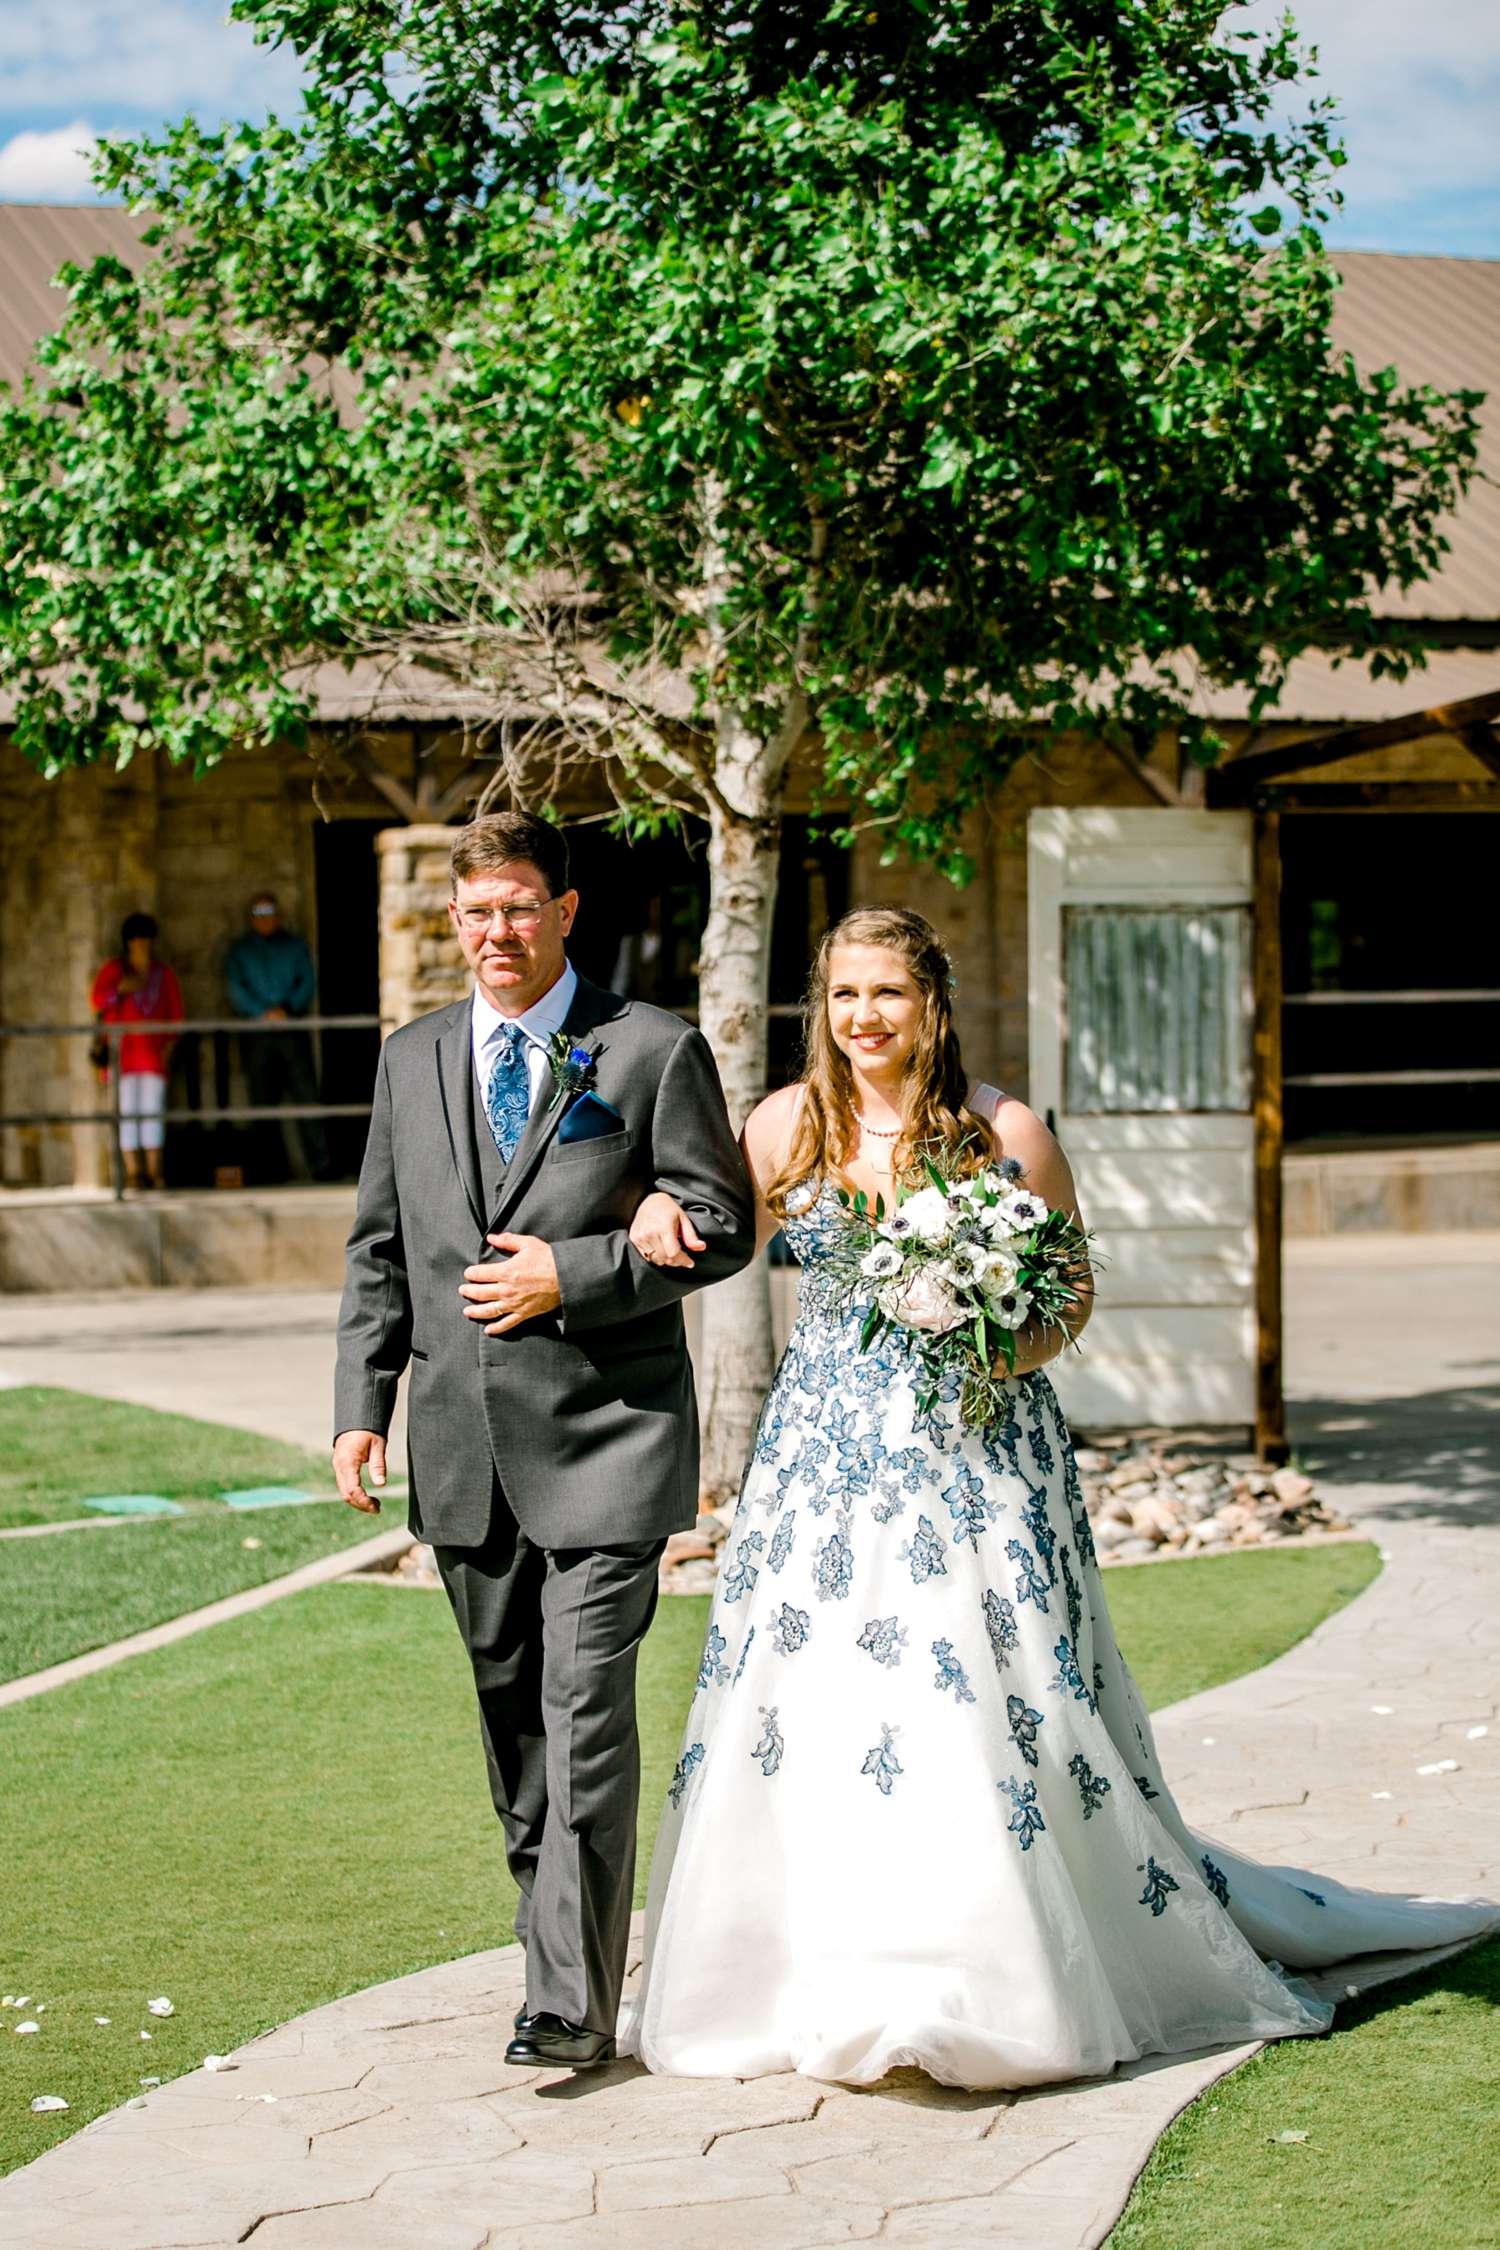 TY+NATHAN+HALLIER+ALLEEJ+WEDDING+PHOTOGRAPHER+RANSOM+CANYON_0070.jpg